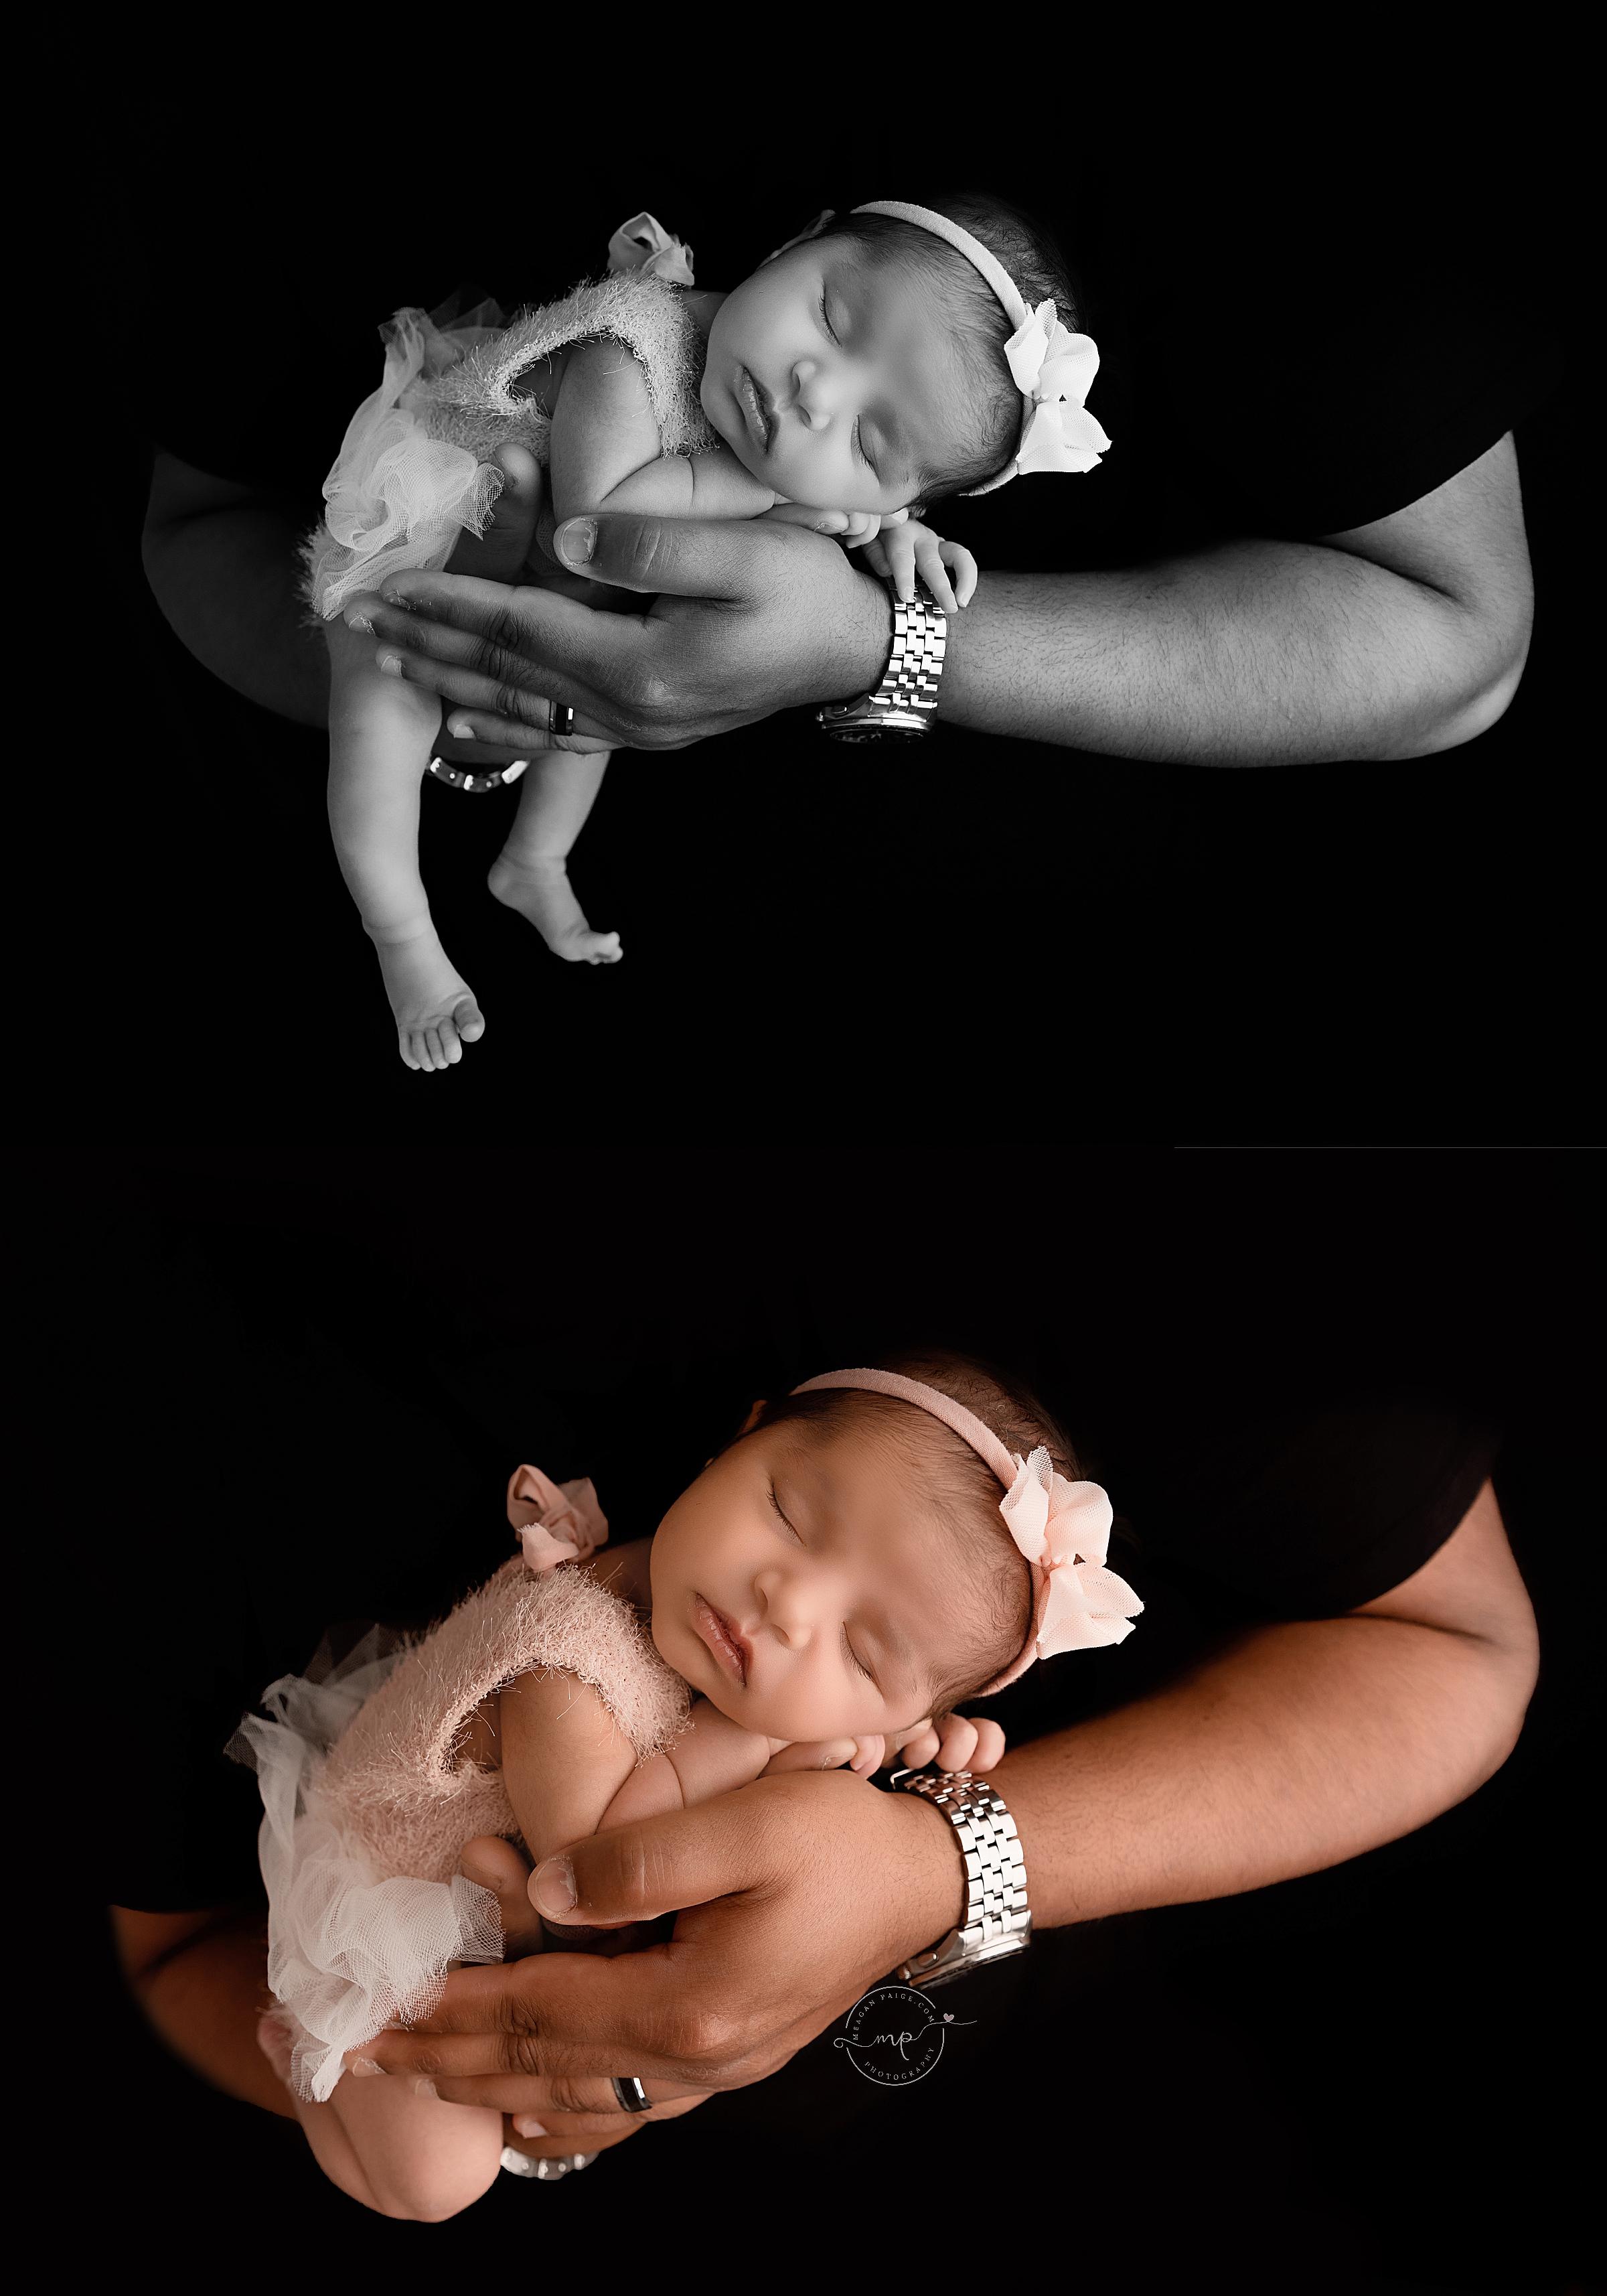 Rainbow Baby Newborn Session - Calgary Newborn Photographer - Meagan Paige Photography